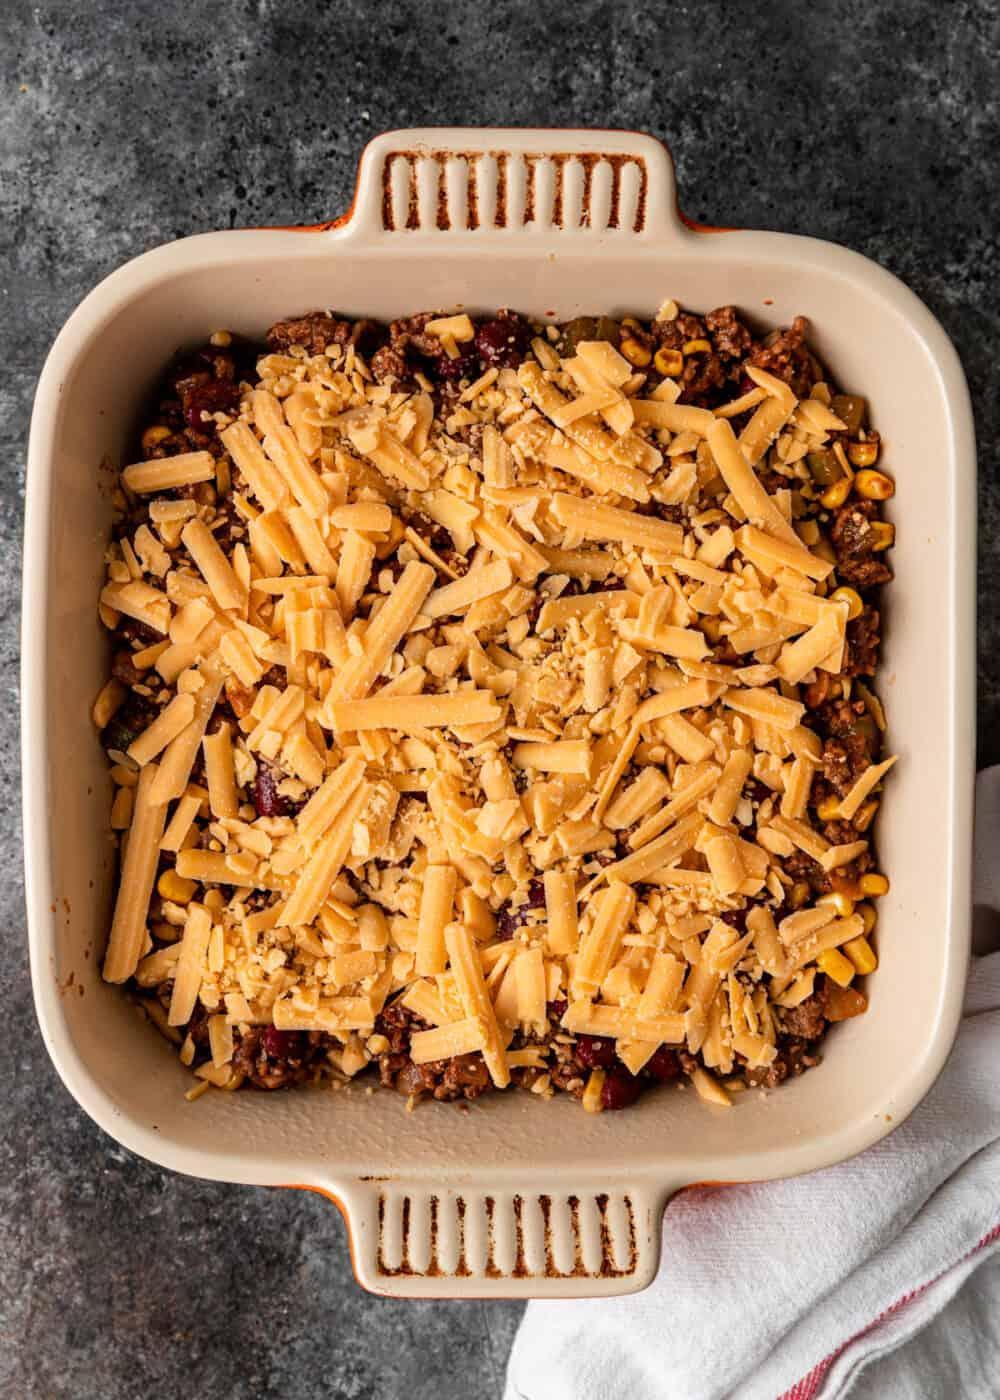 overhead: shredded cheddar cheese over tex mex chili in casserole dish